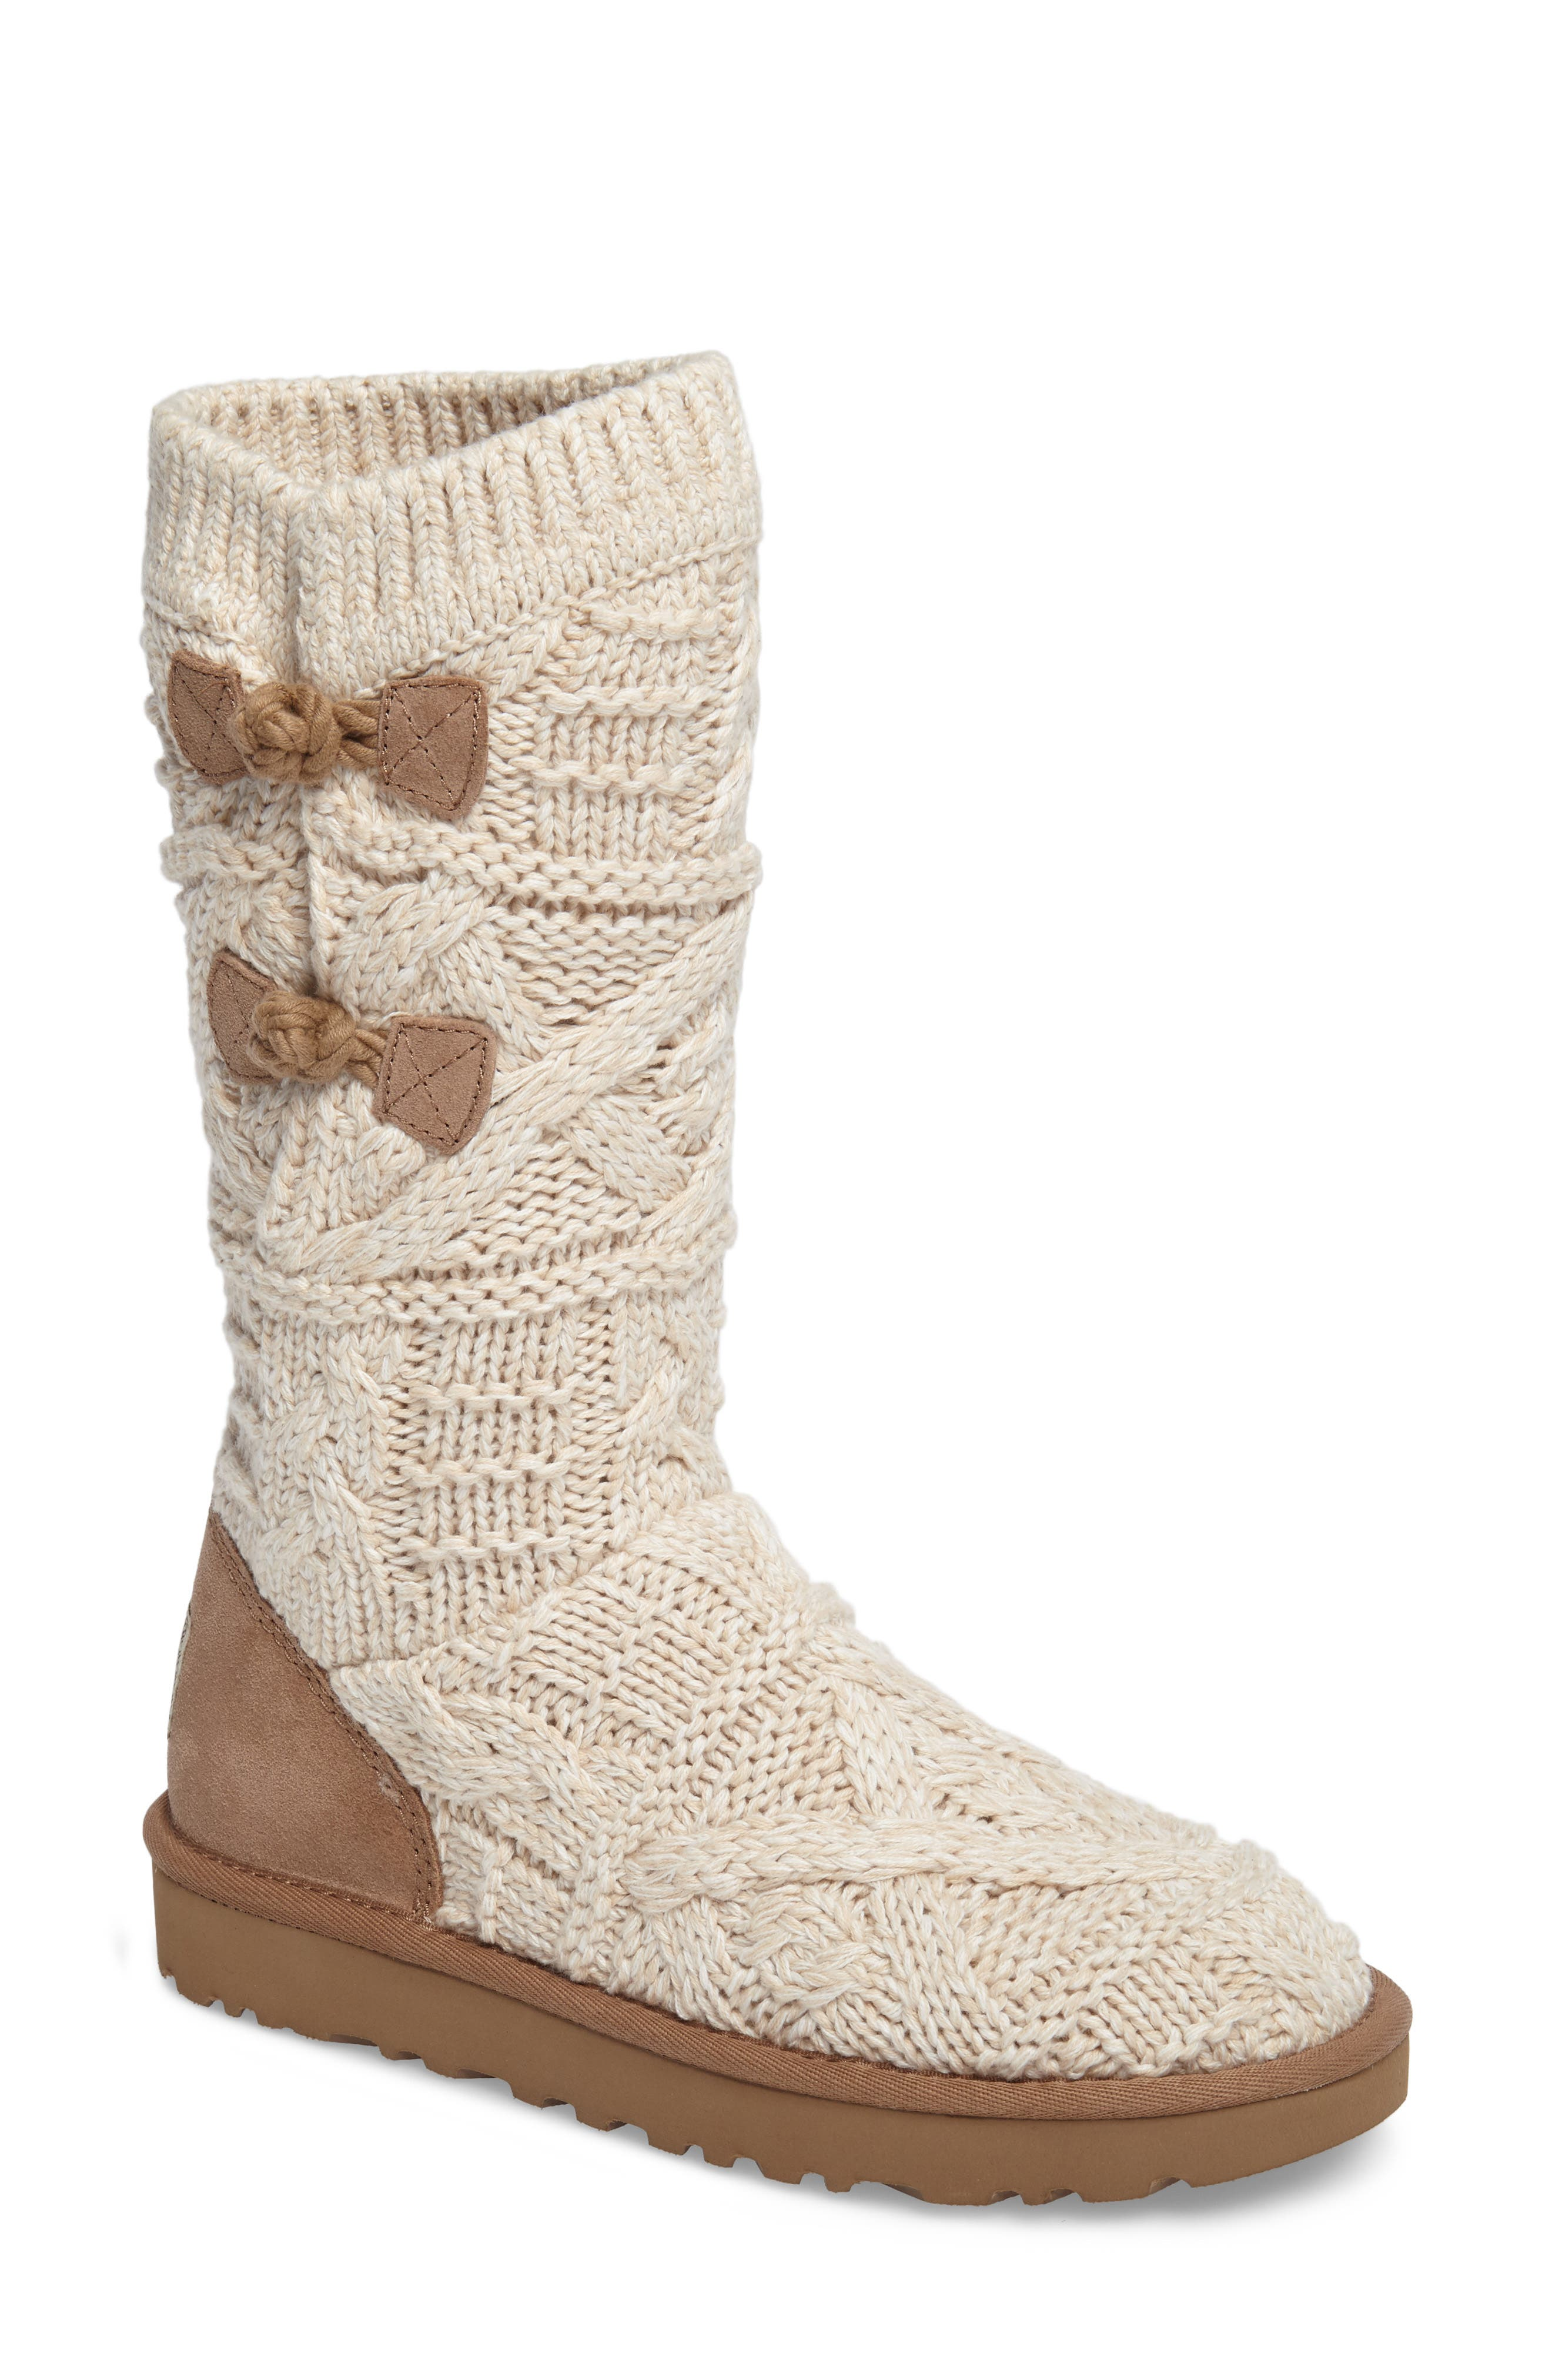 Alternate Image 1 Selected - UGG® Kalla Boot (Women)